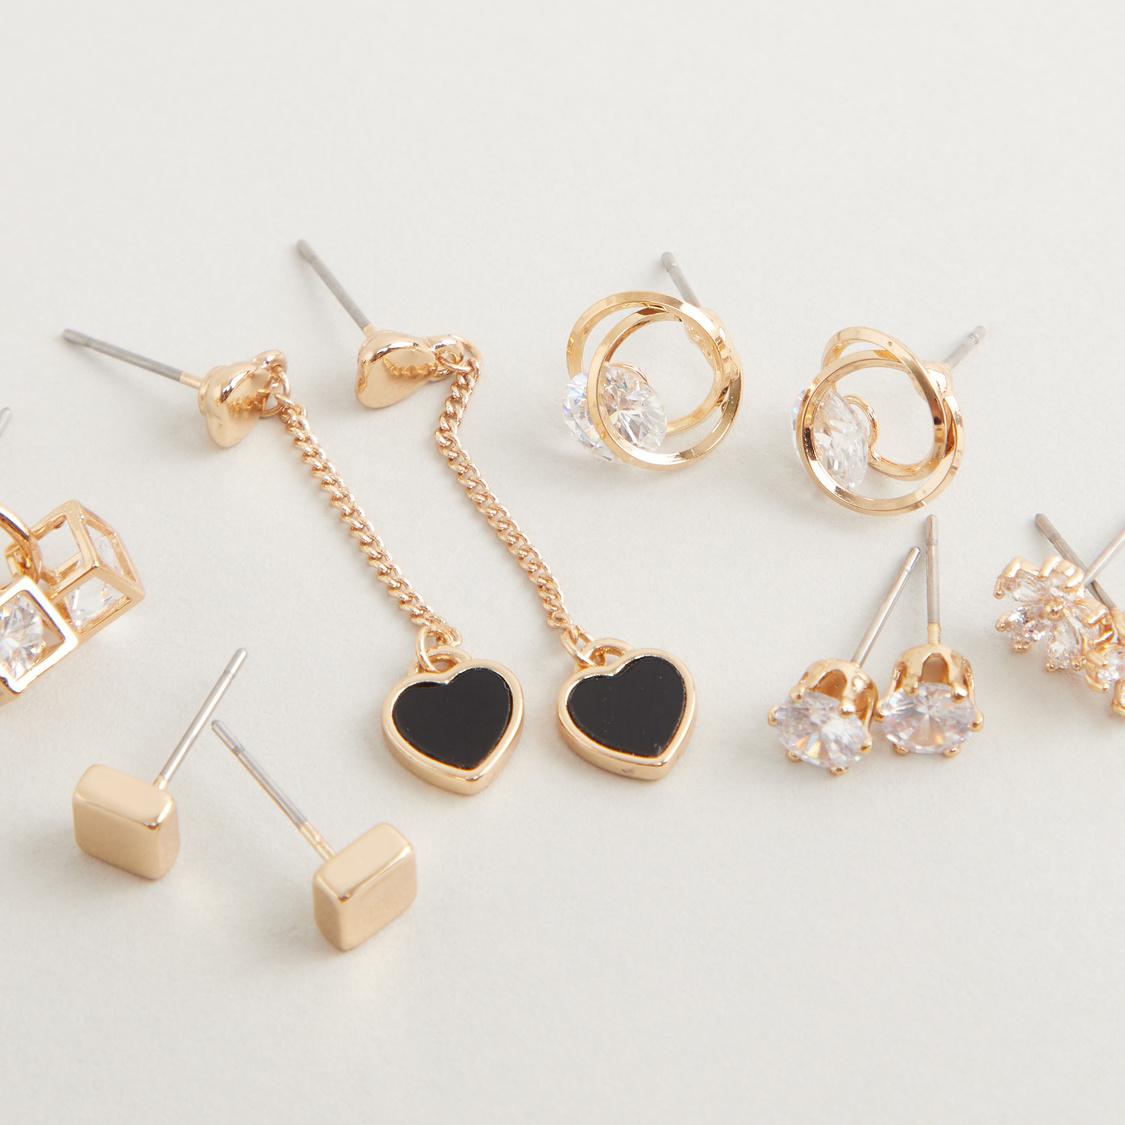 Set of 6 - Crystal Studded Earrings